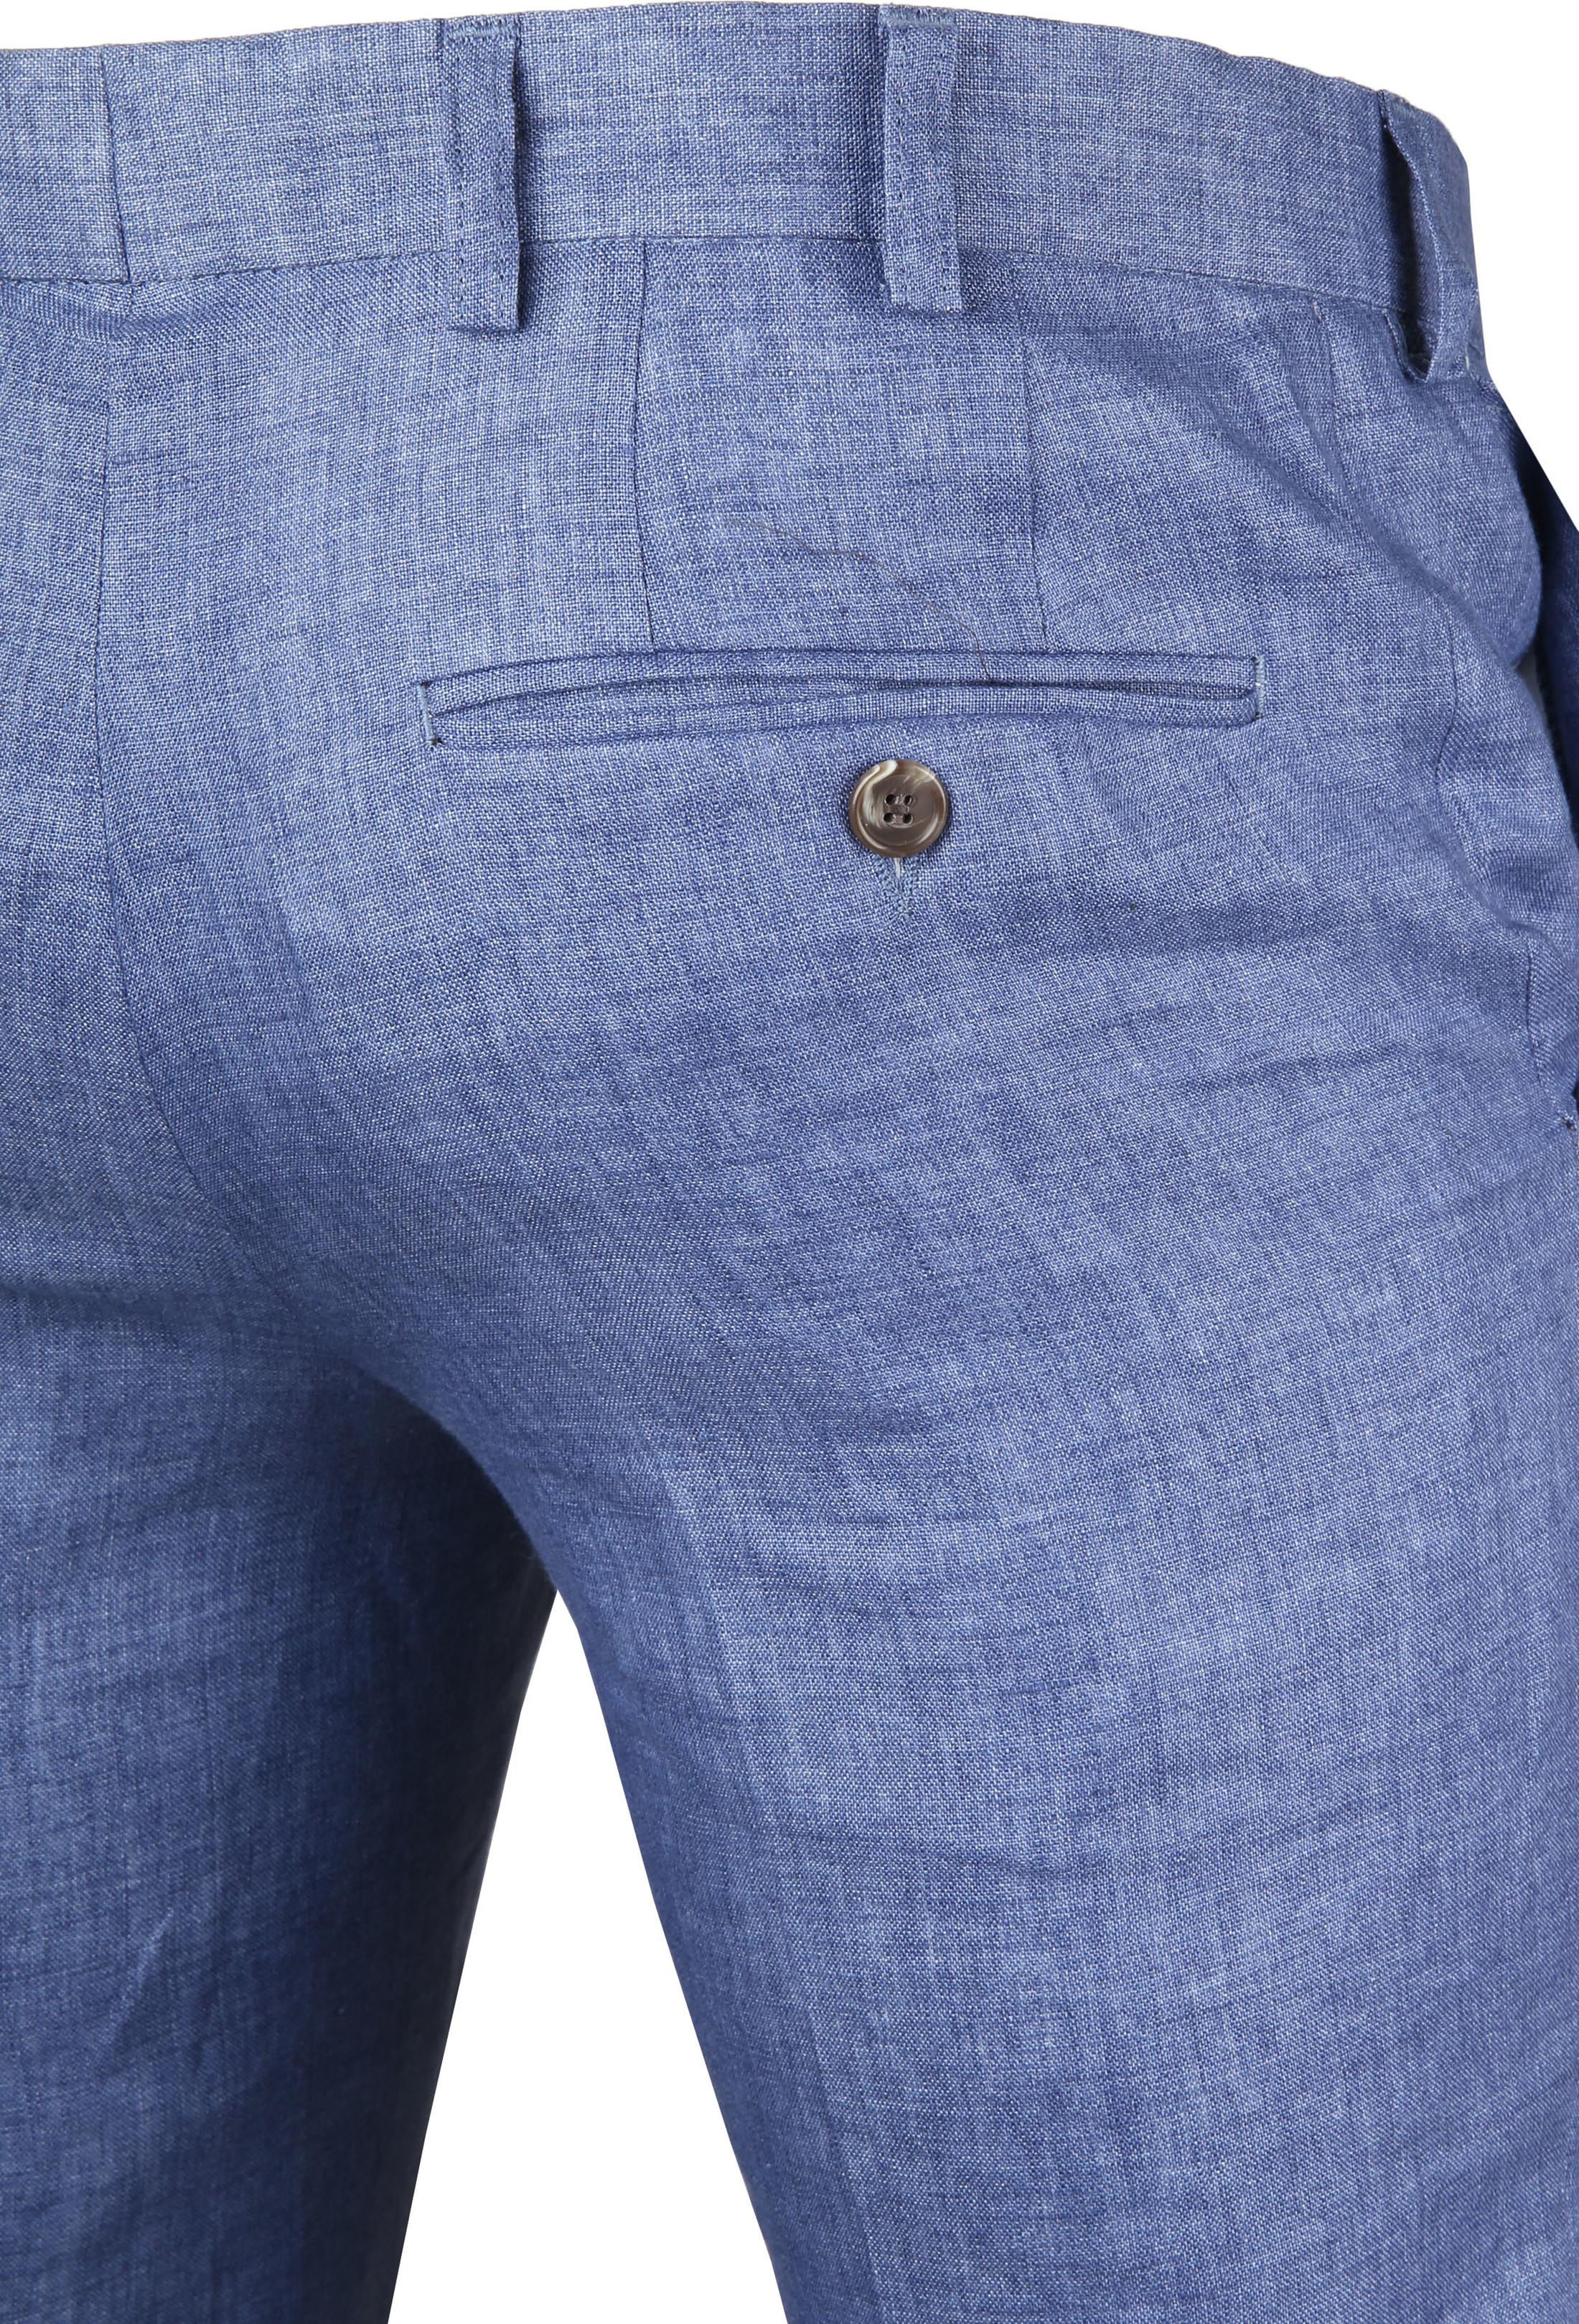 Linnen Pantalon Blauw foto 1